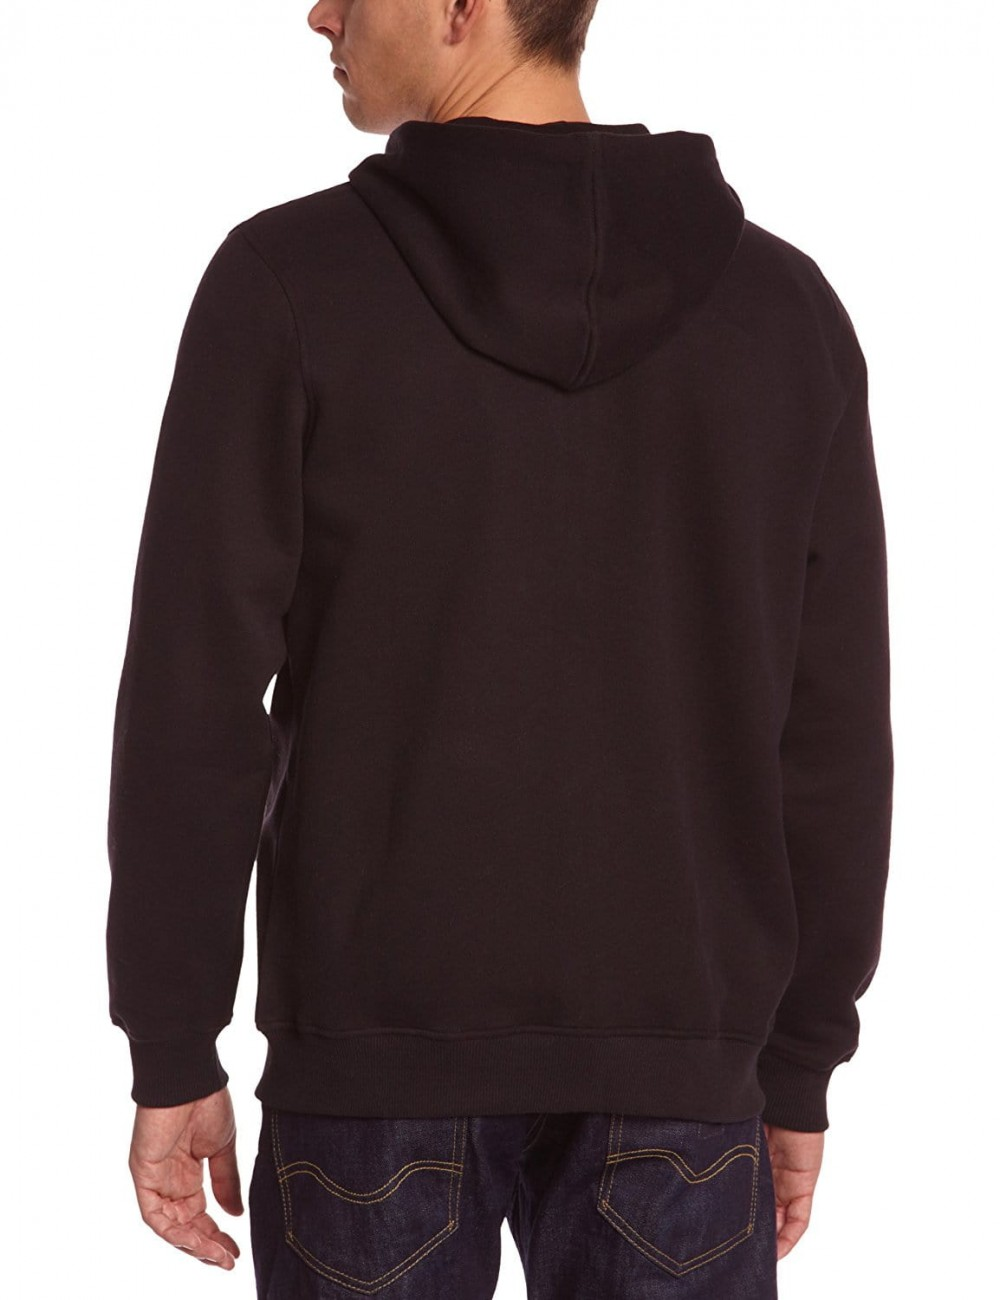 Кофта BILLABONG plasma hoodie (размер L) - 1